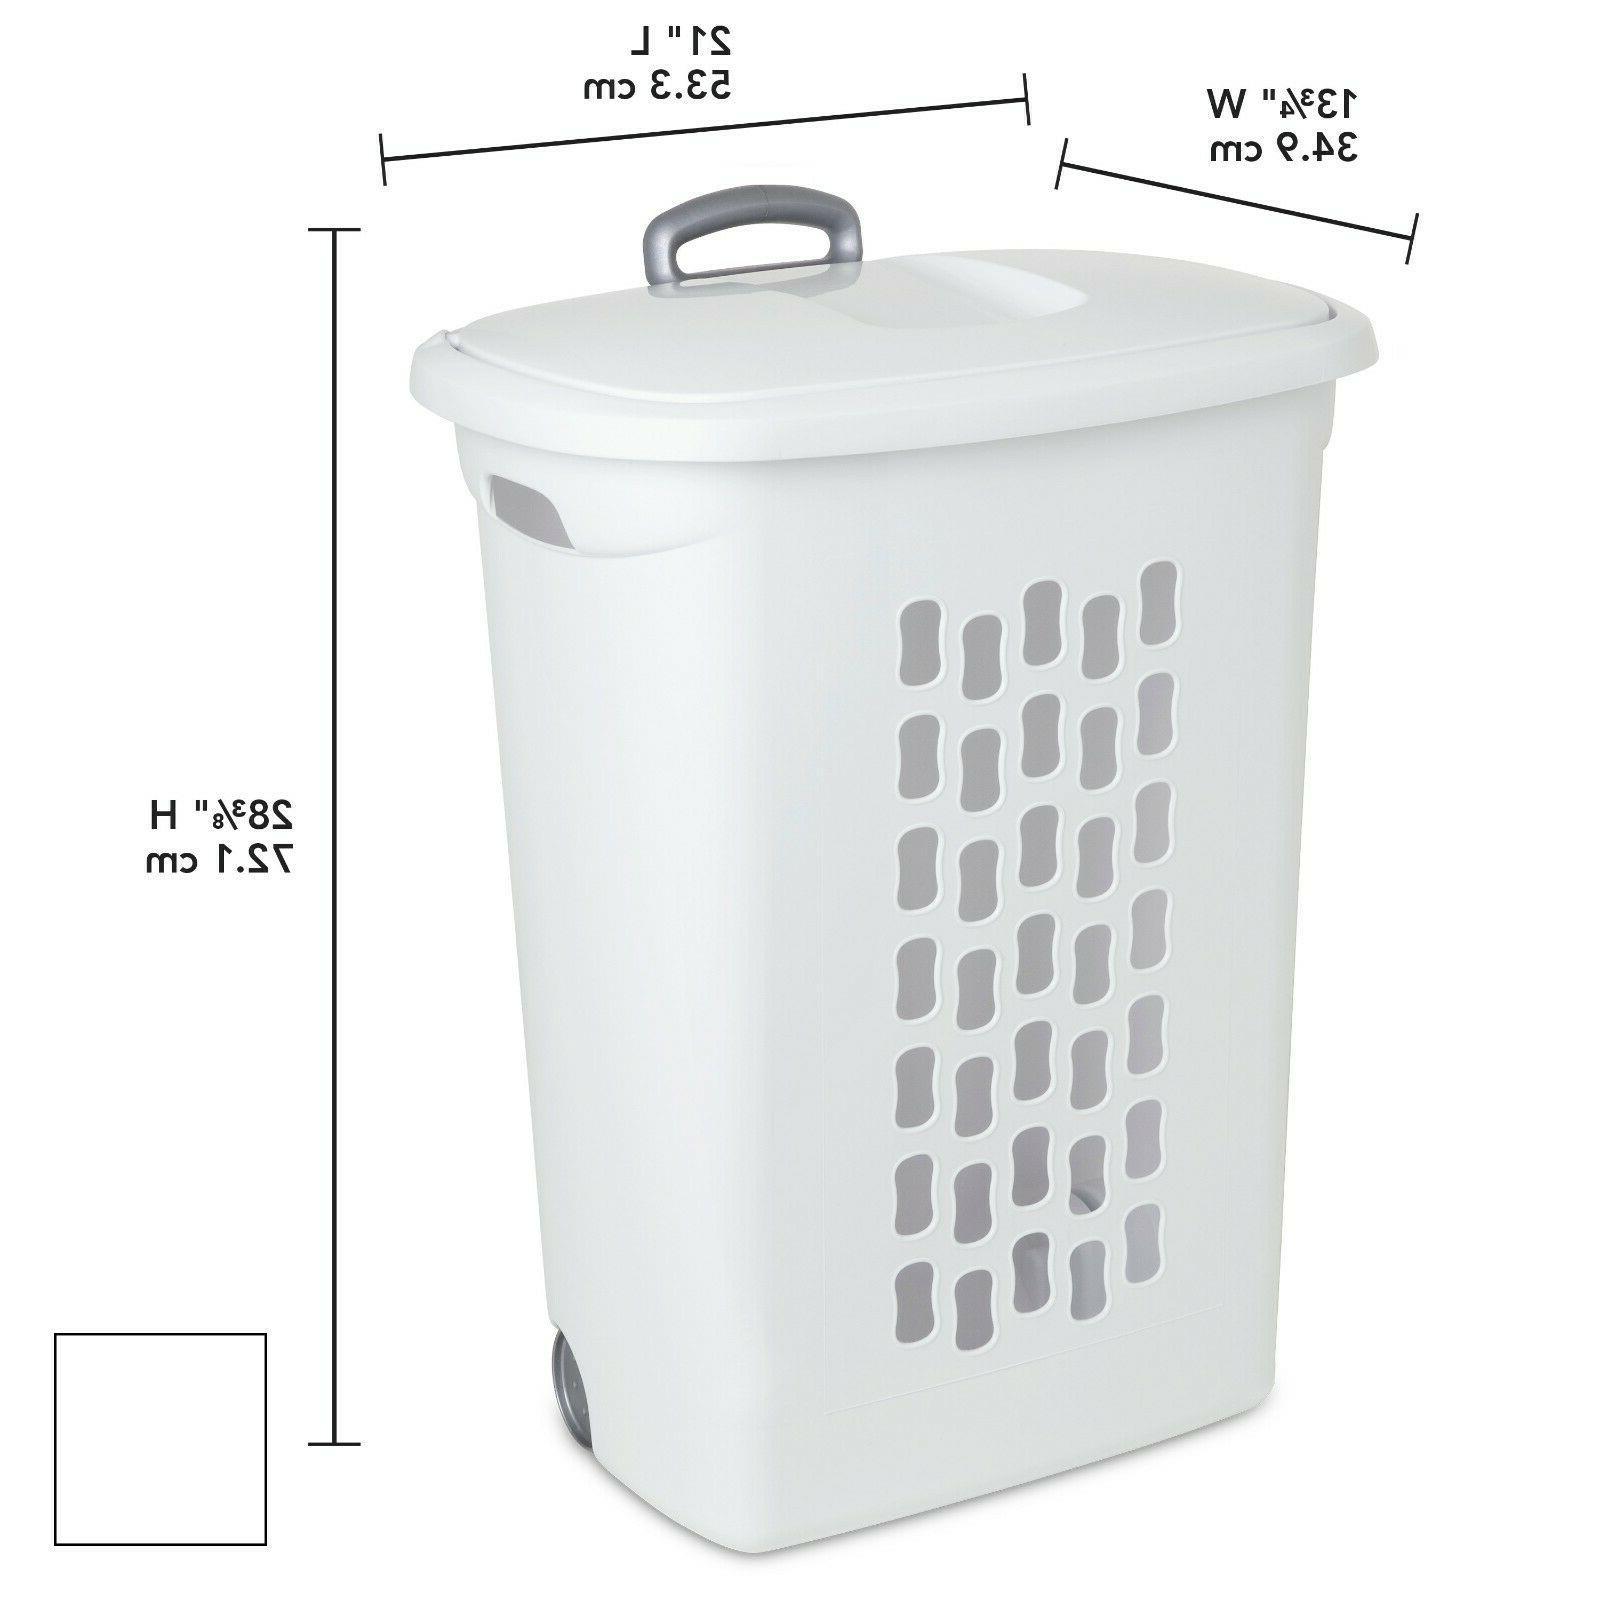 3 PACK Laundry Hamper Rolling Basket Clothes Storage